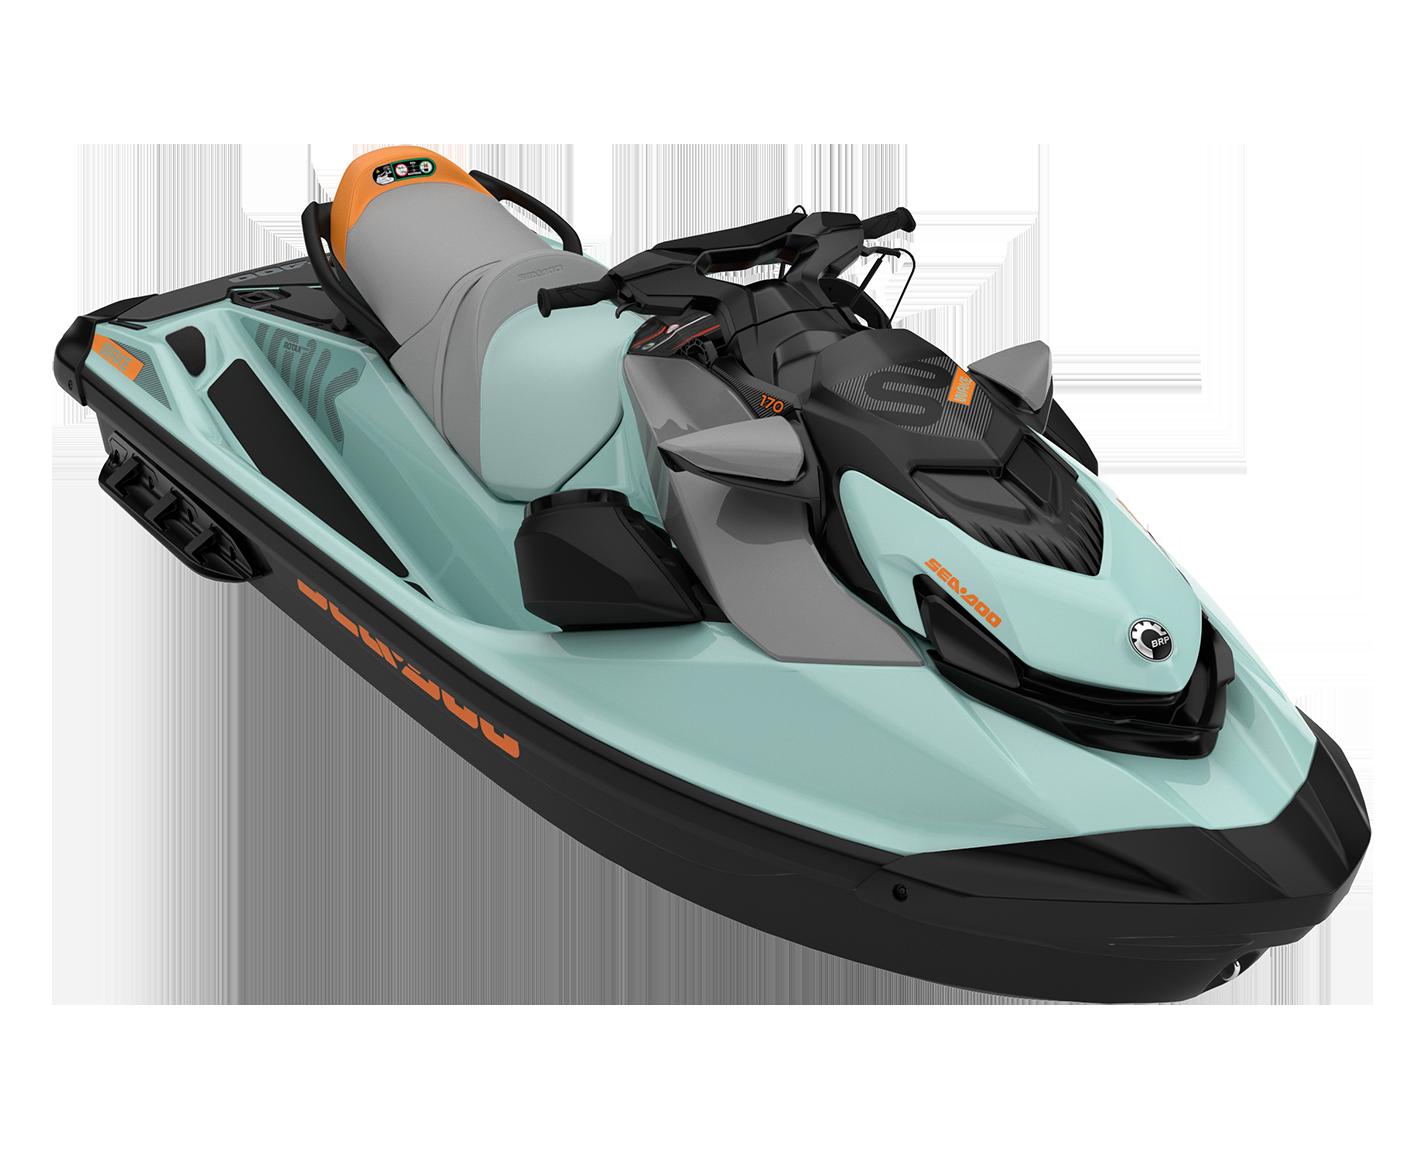 Comprar moto de agua Sea-Doo Wake 170 en Barcelona